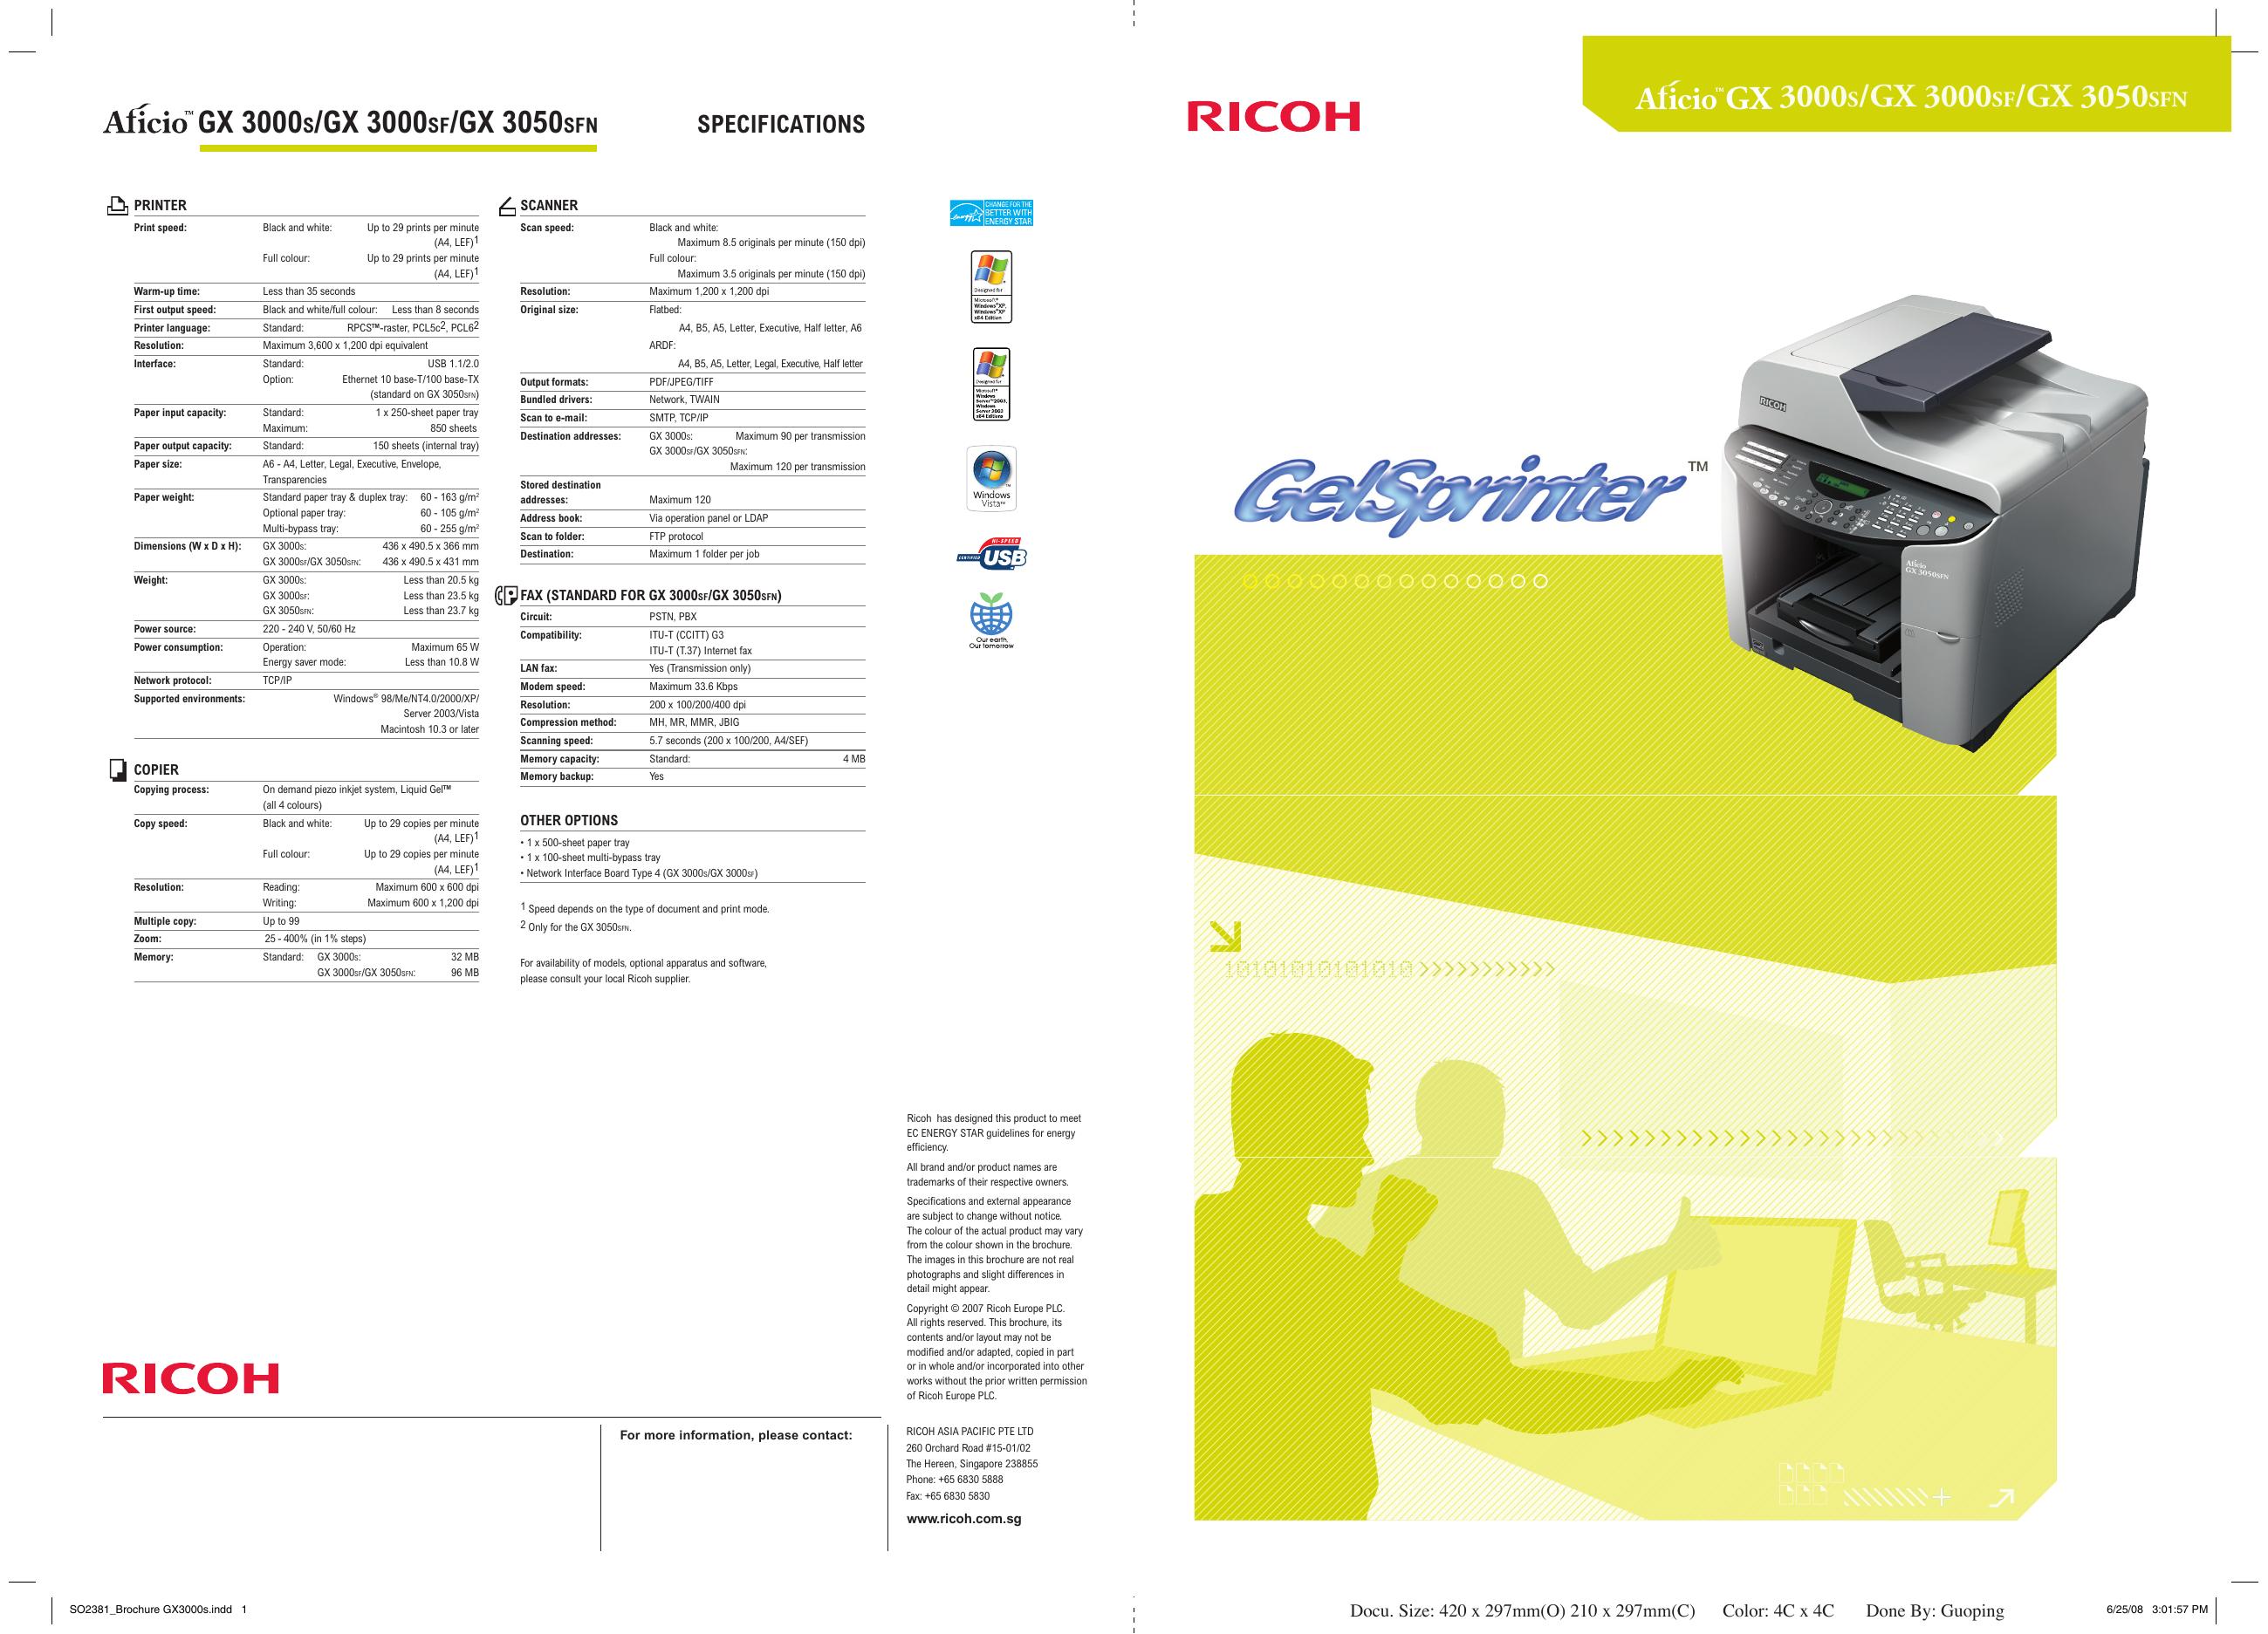 DRIVERS UPDATE: RICOH AFICIO GX 3050SFN RPCS RASTER